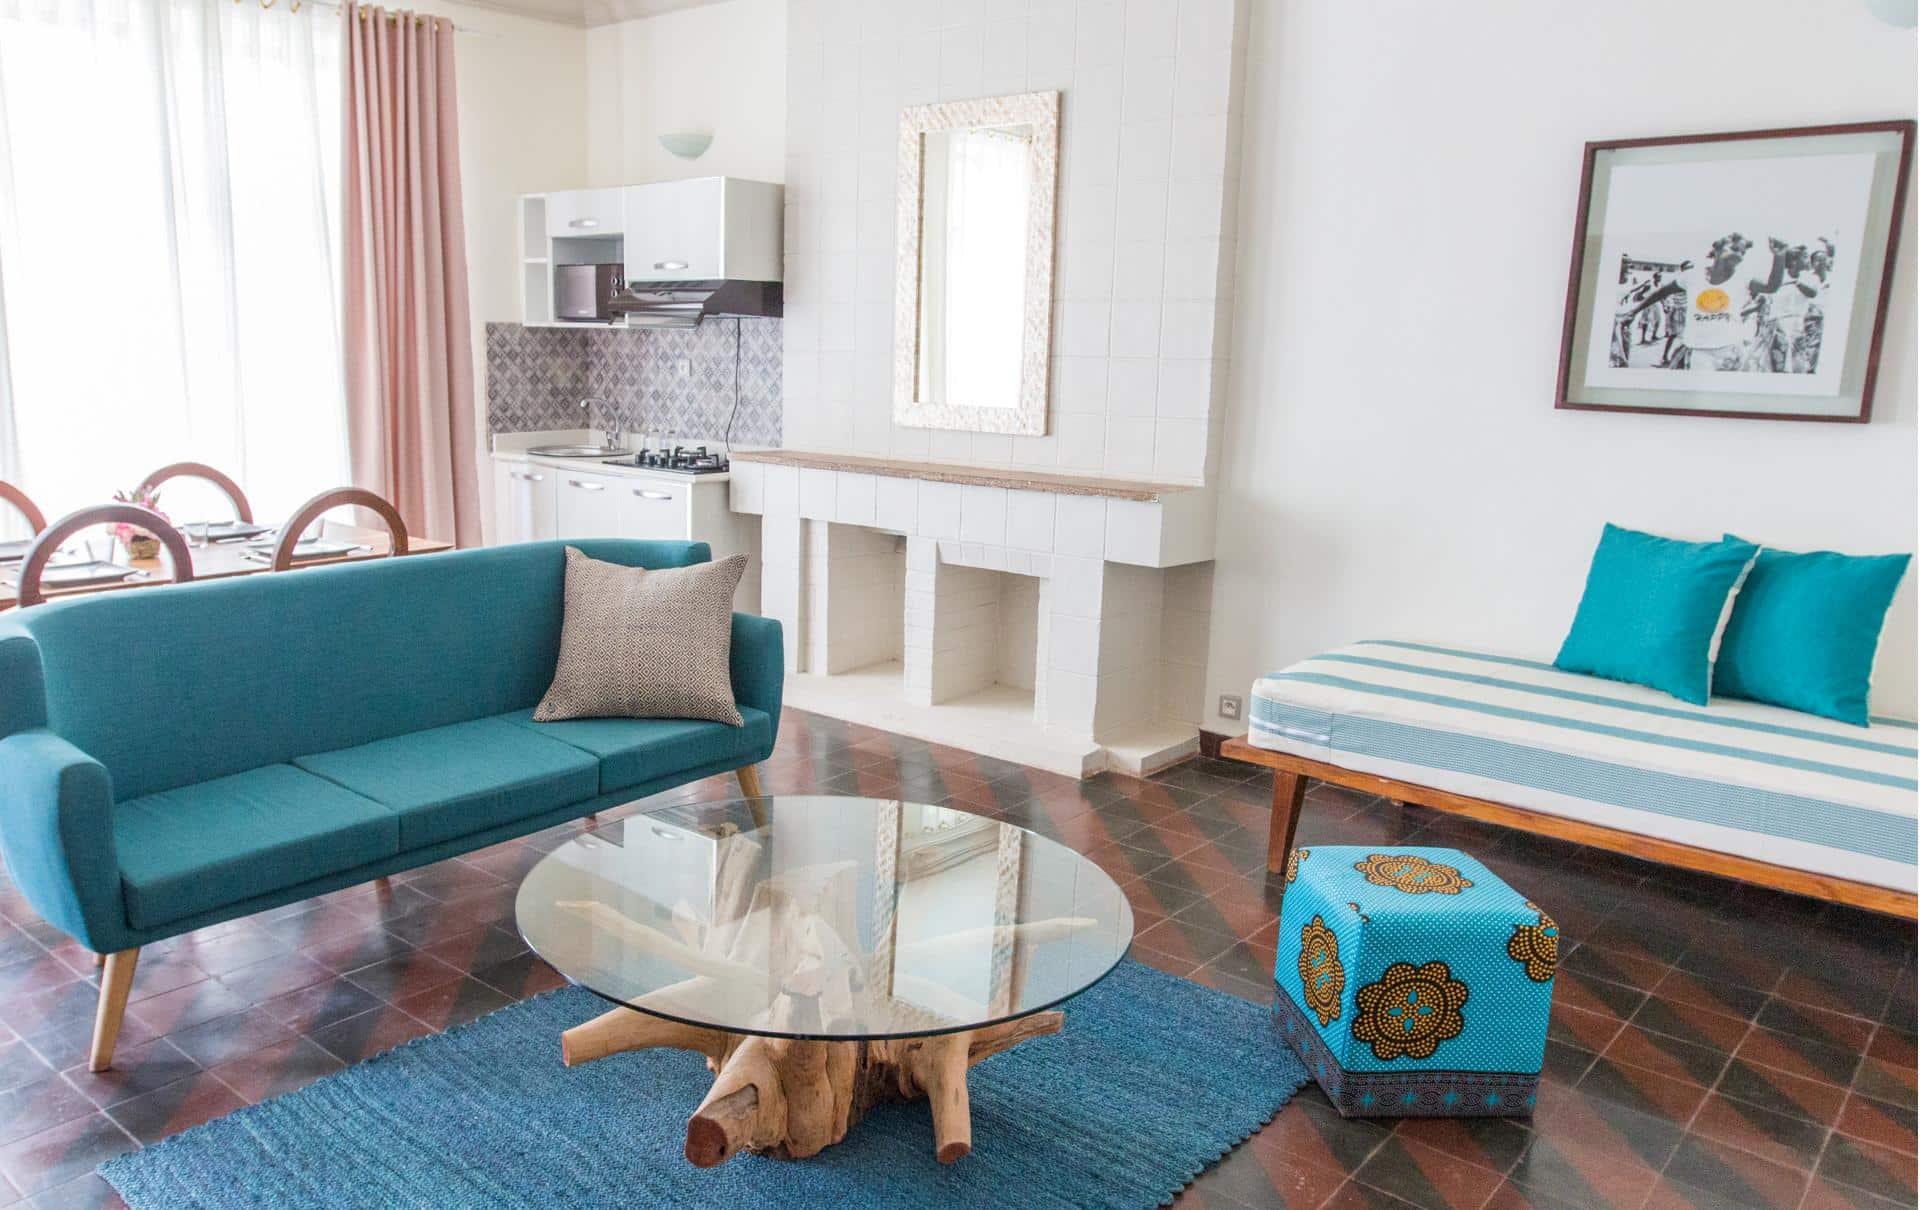 Hotels Buchung Madagaskar   Online Hotel Reservation zum besten Preis